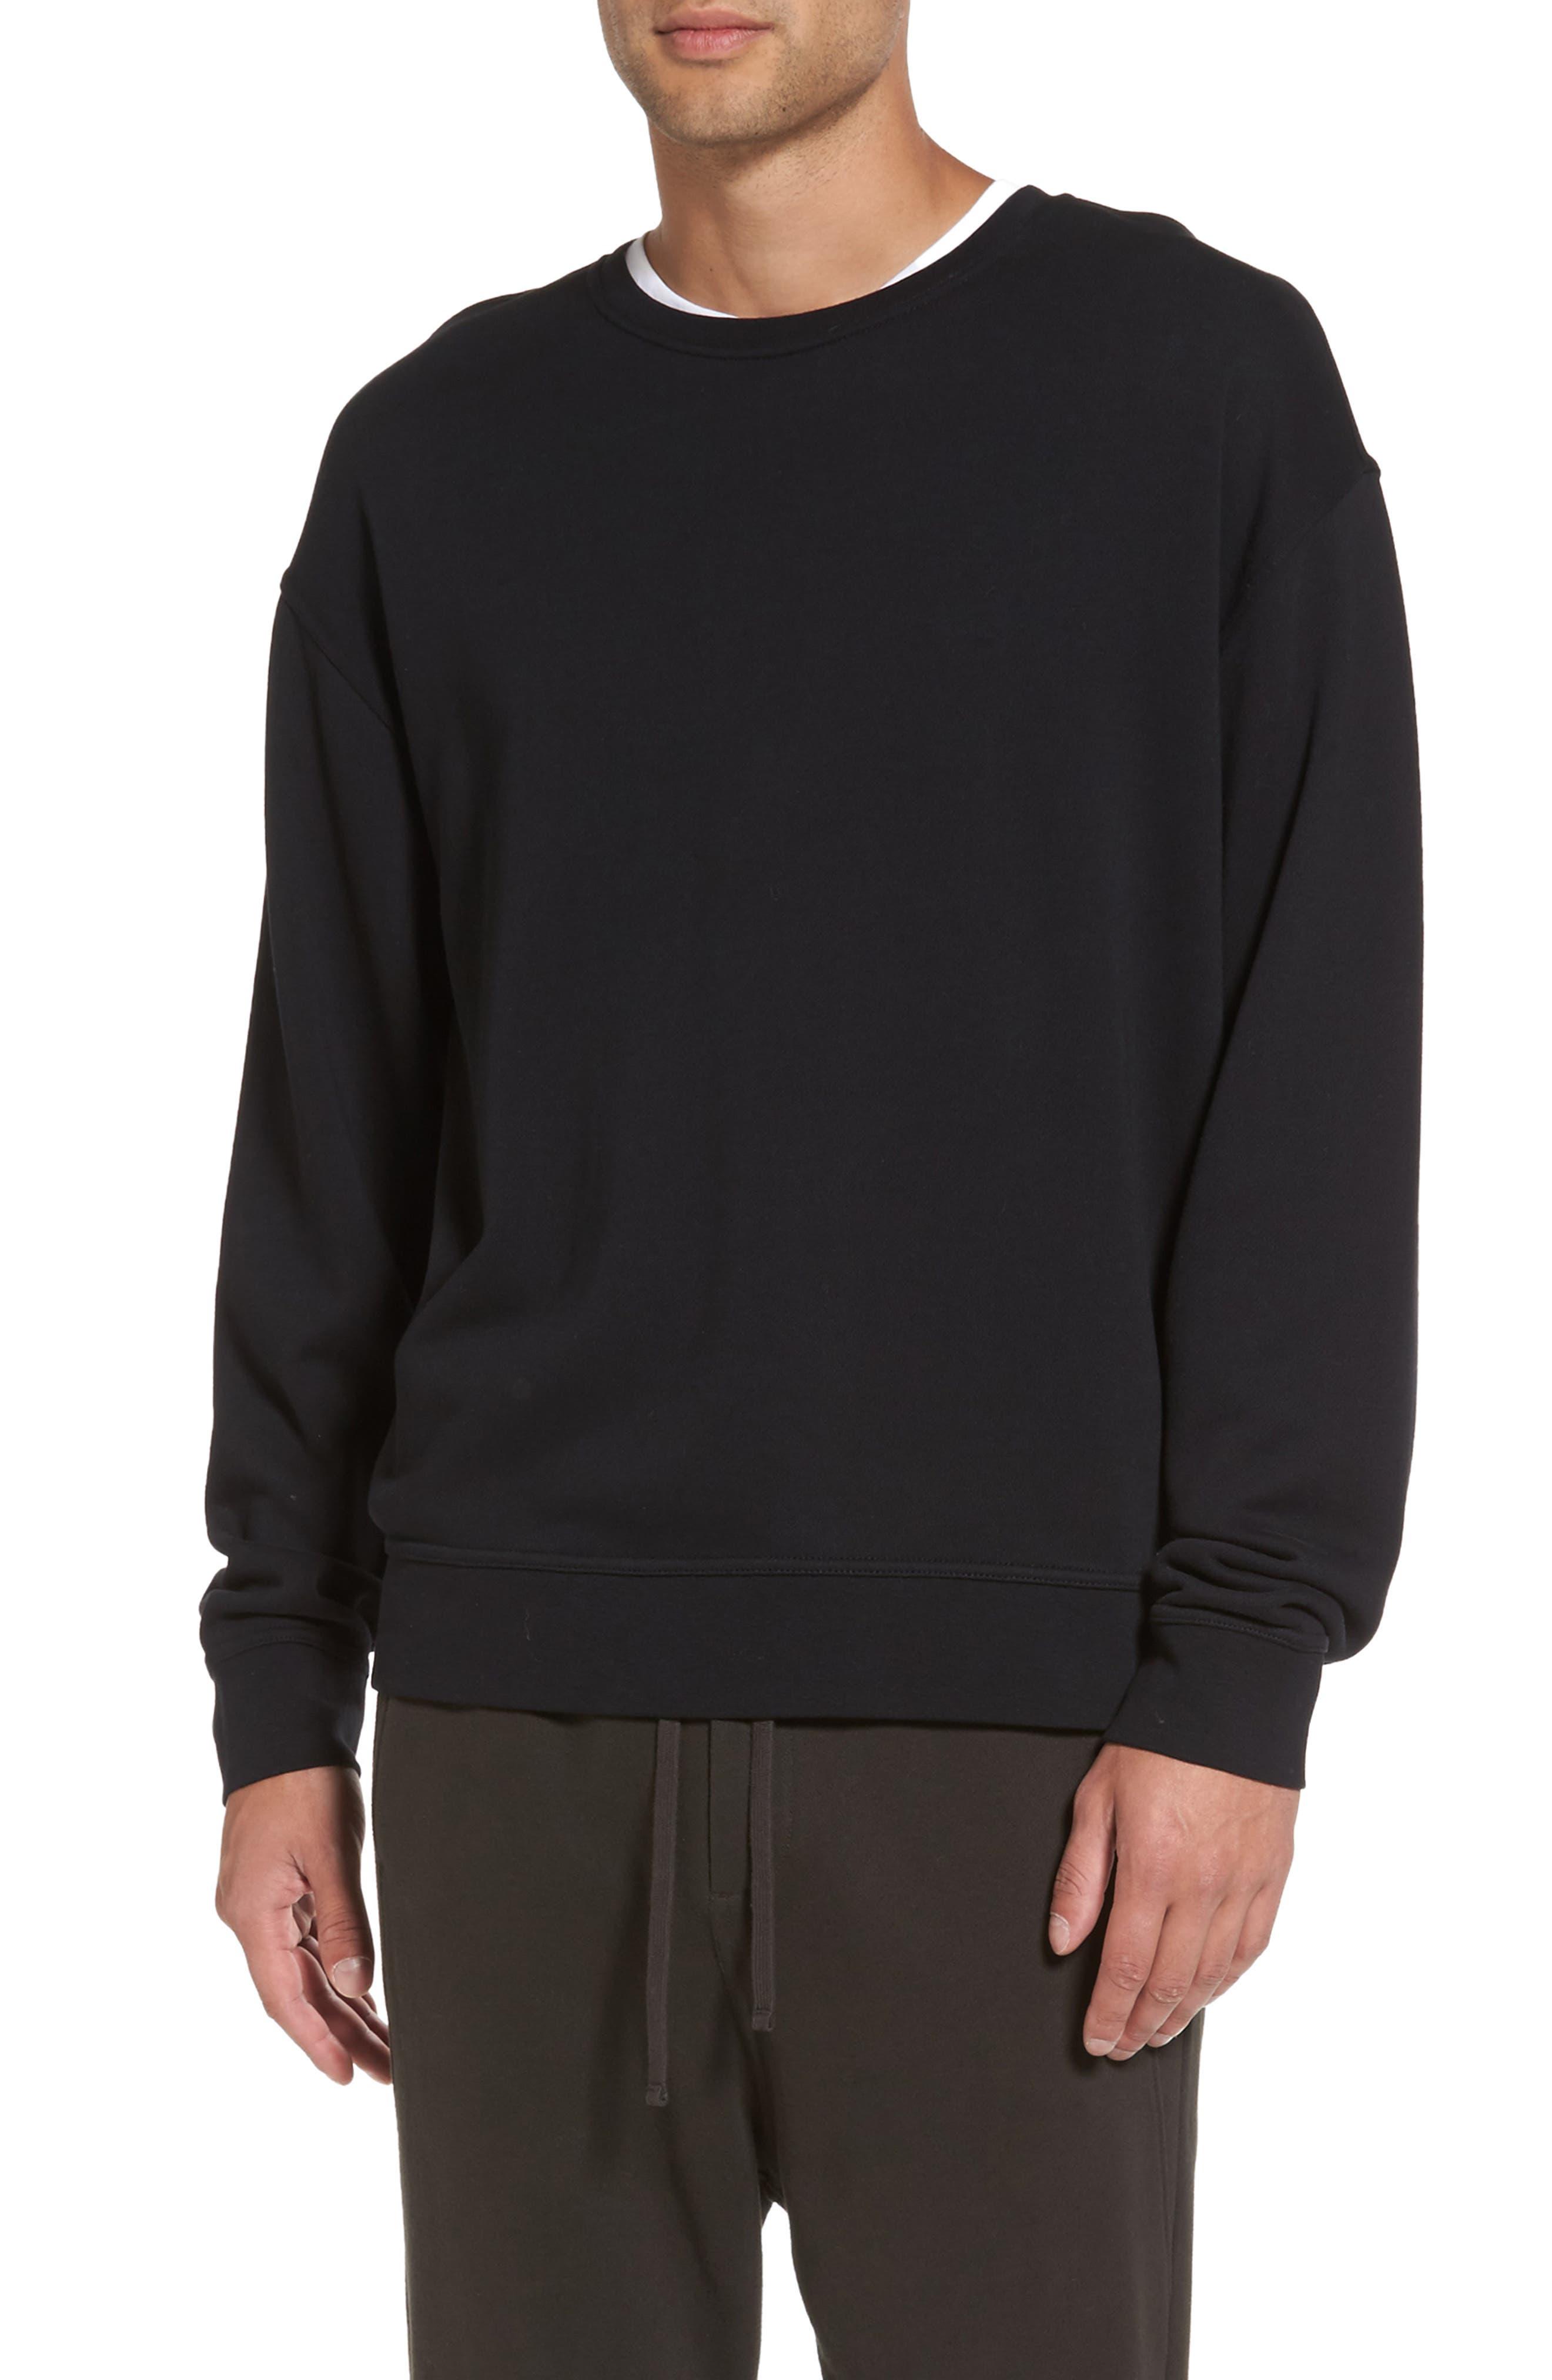 Alternate Image 1 Selected - Vince Crewneck Sweatshirt